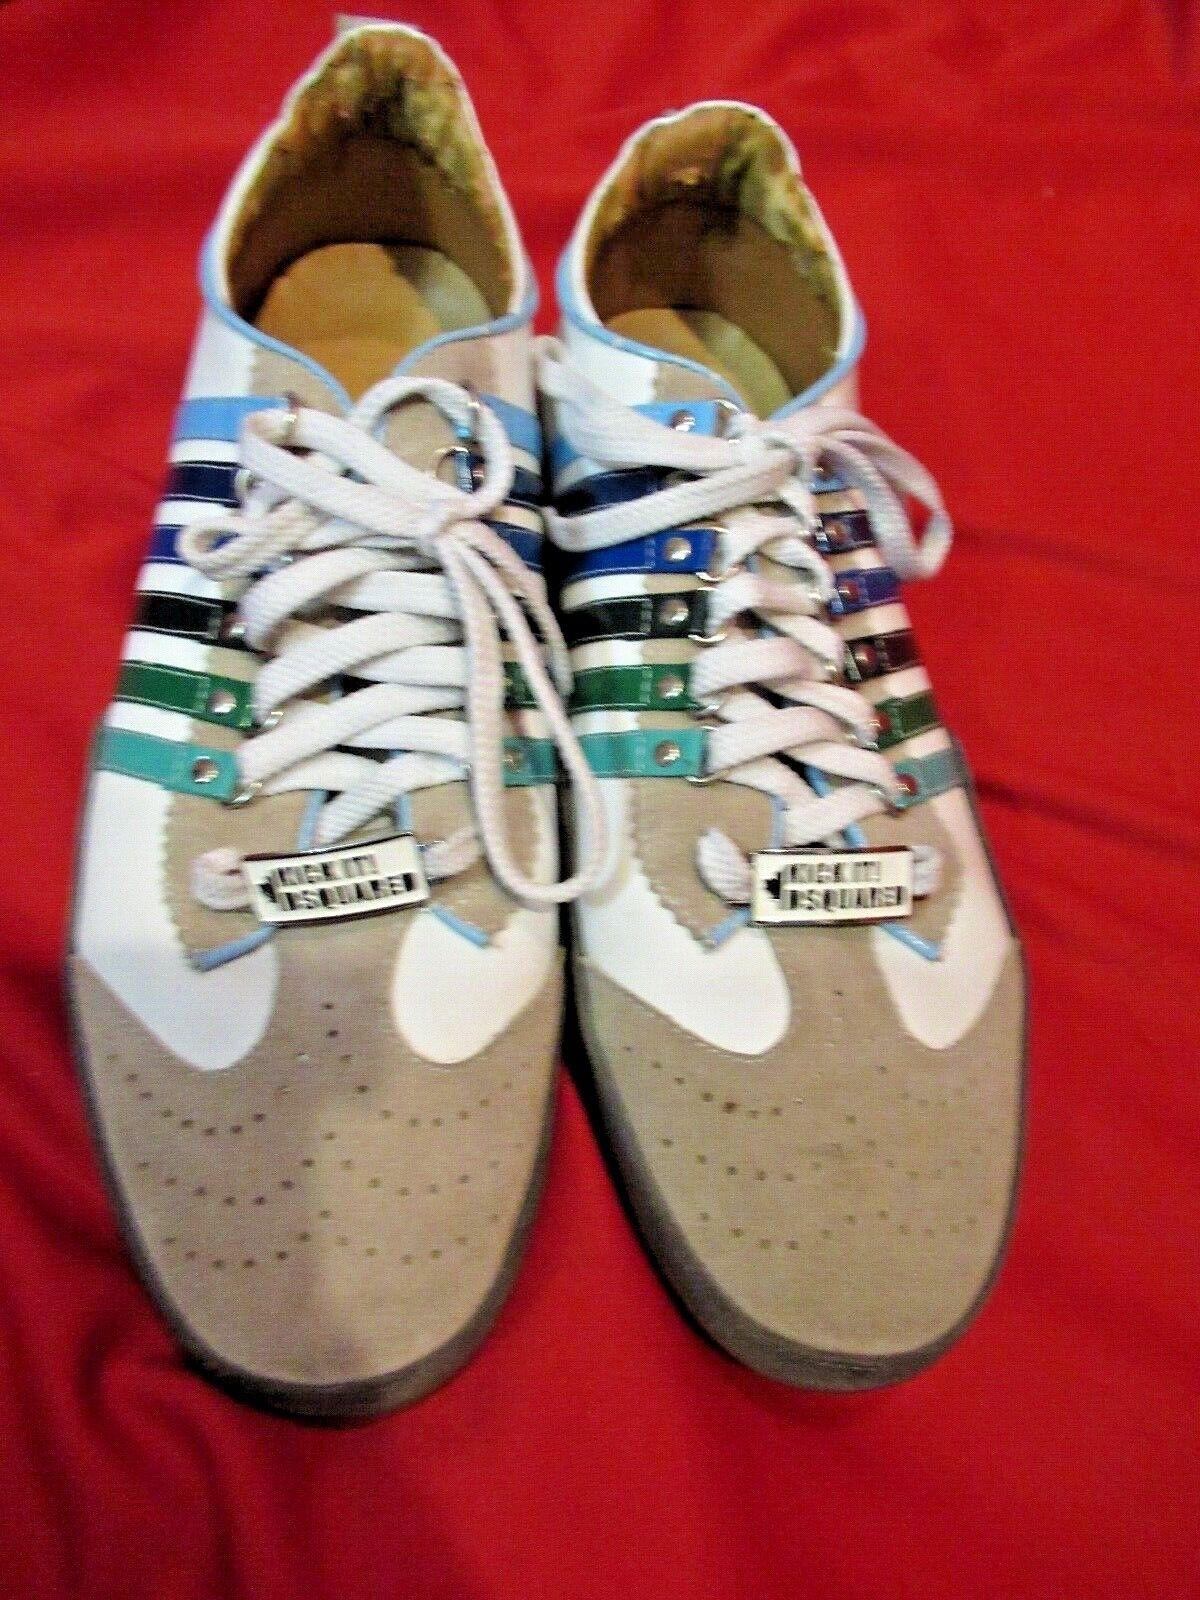 DSQUARED 2 Men's Training Tennis shoes 45 11 Original 1964 Get in the fast lane